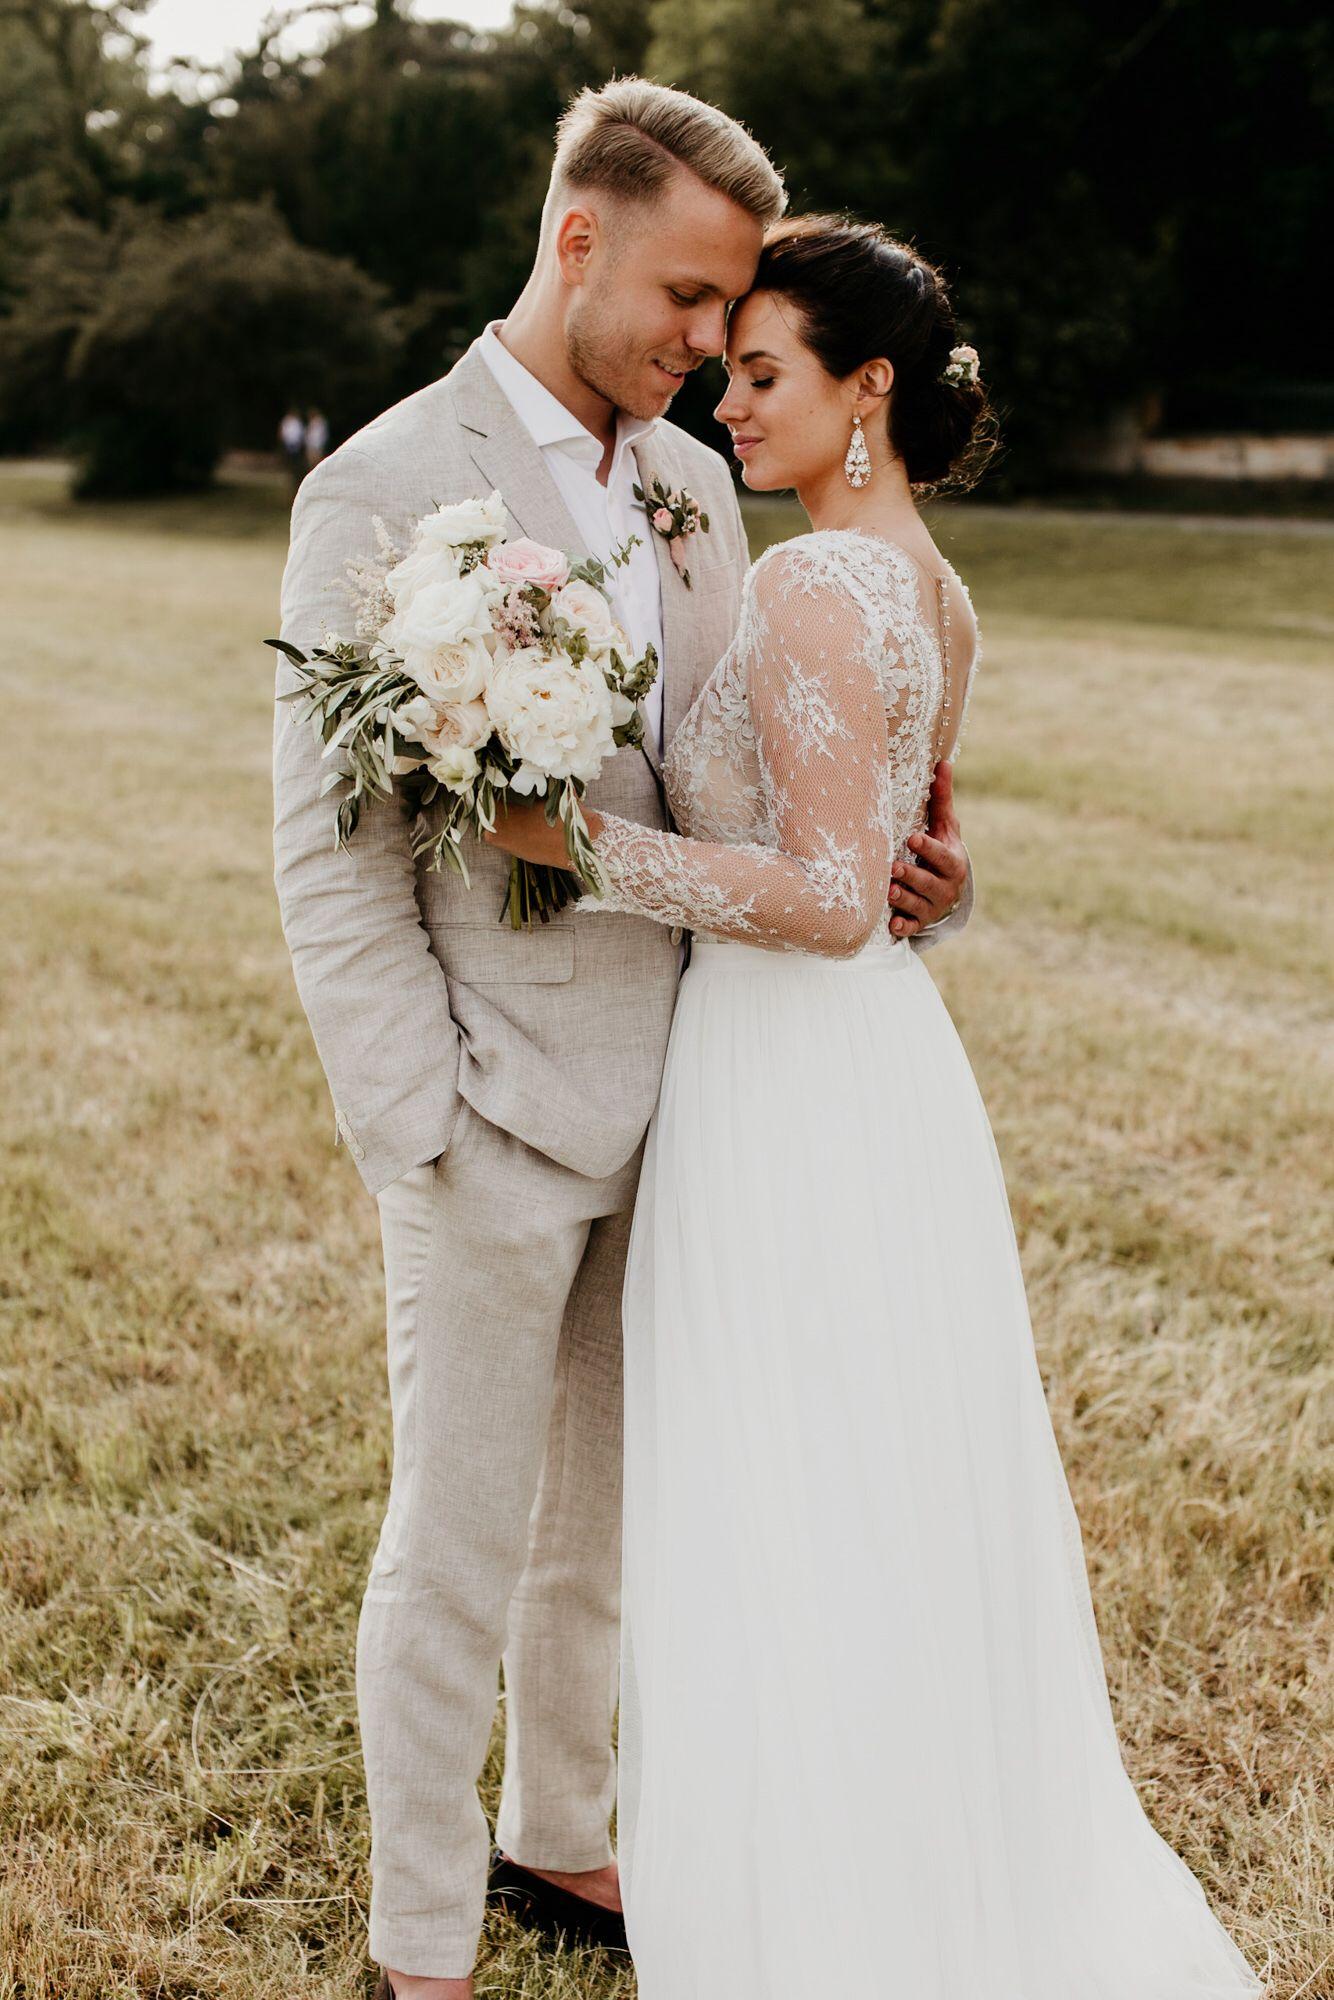 Wedding inspo #bride #groom #hochzeitskleid #bridalmakeup